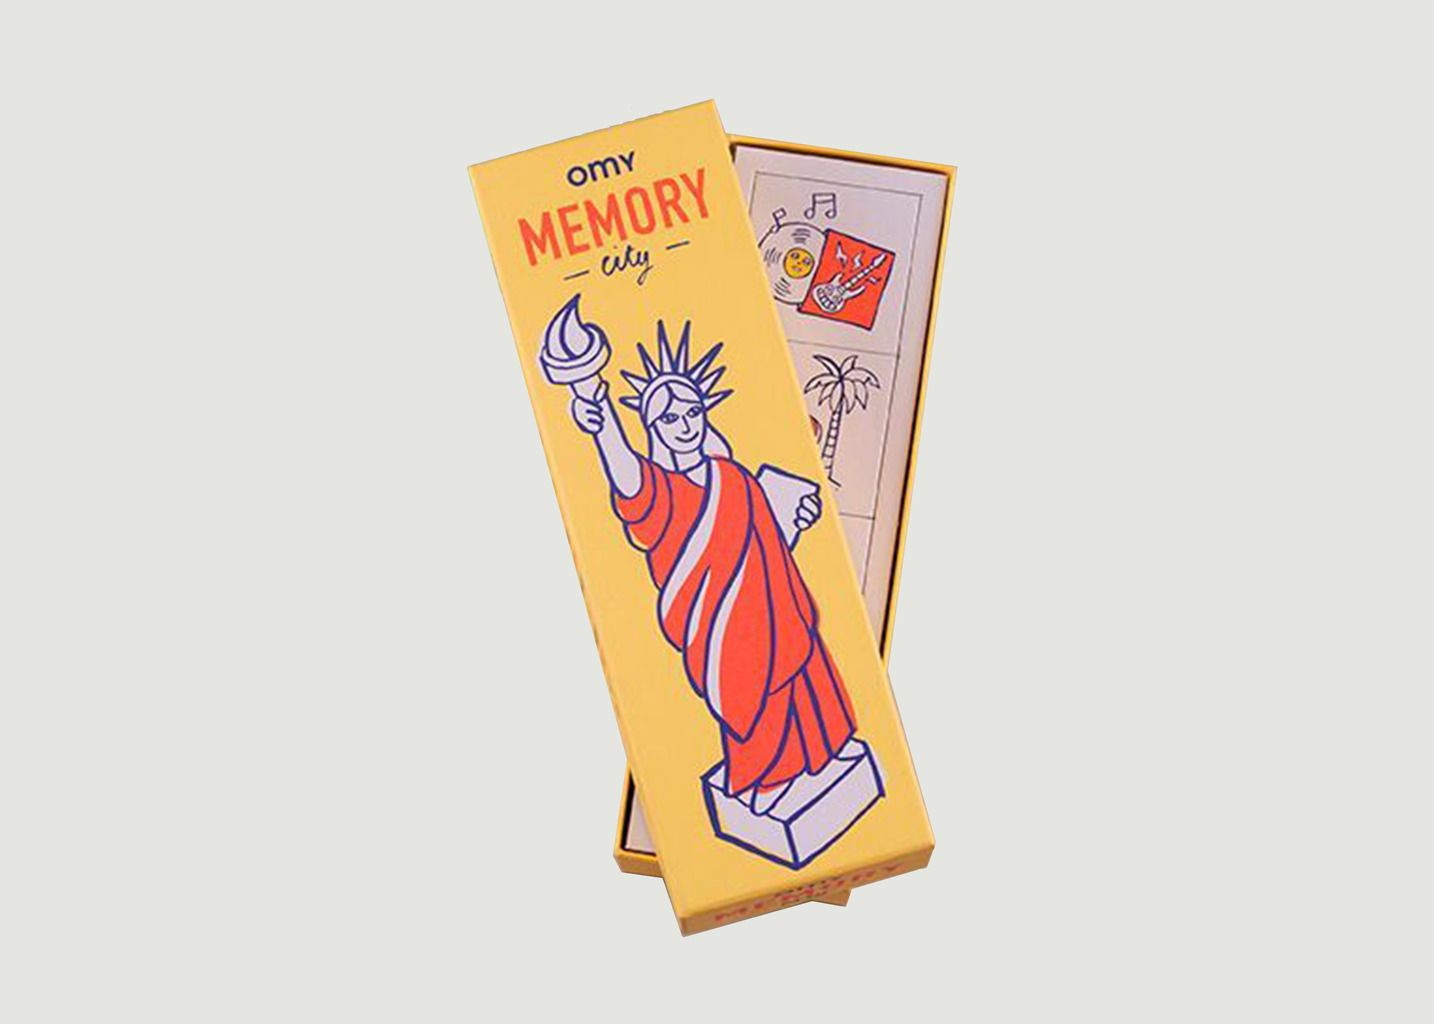 Boîte de Jeux Memory - Omy